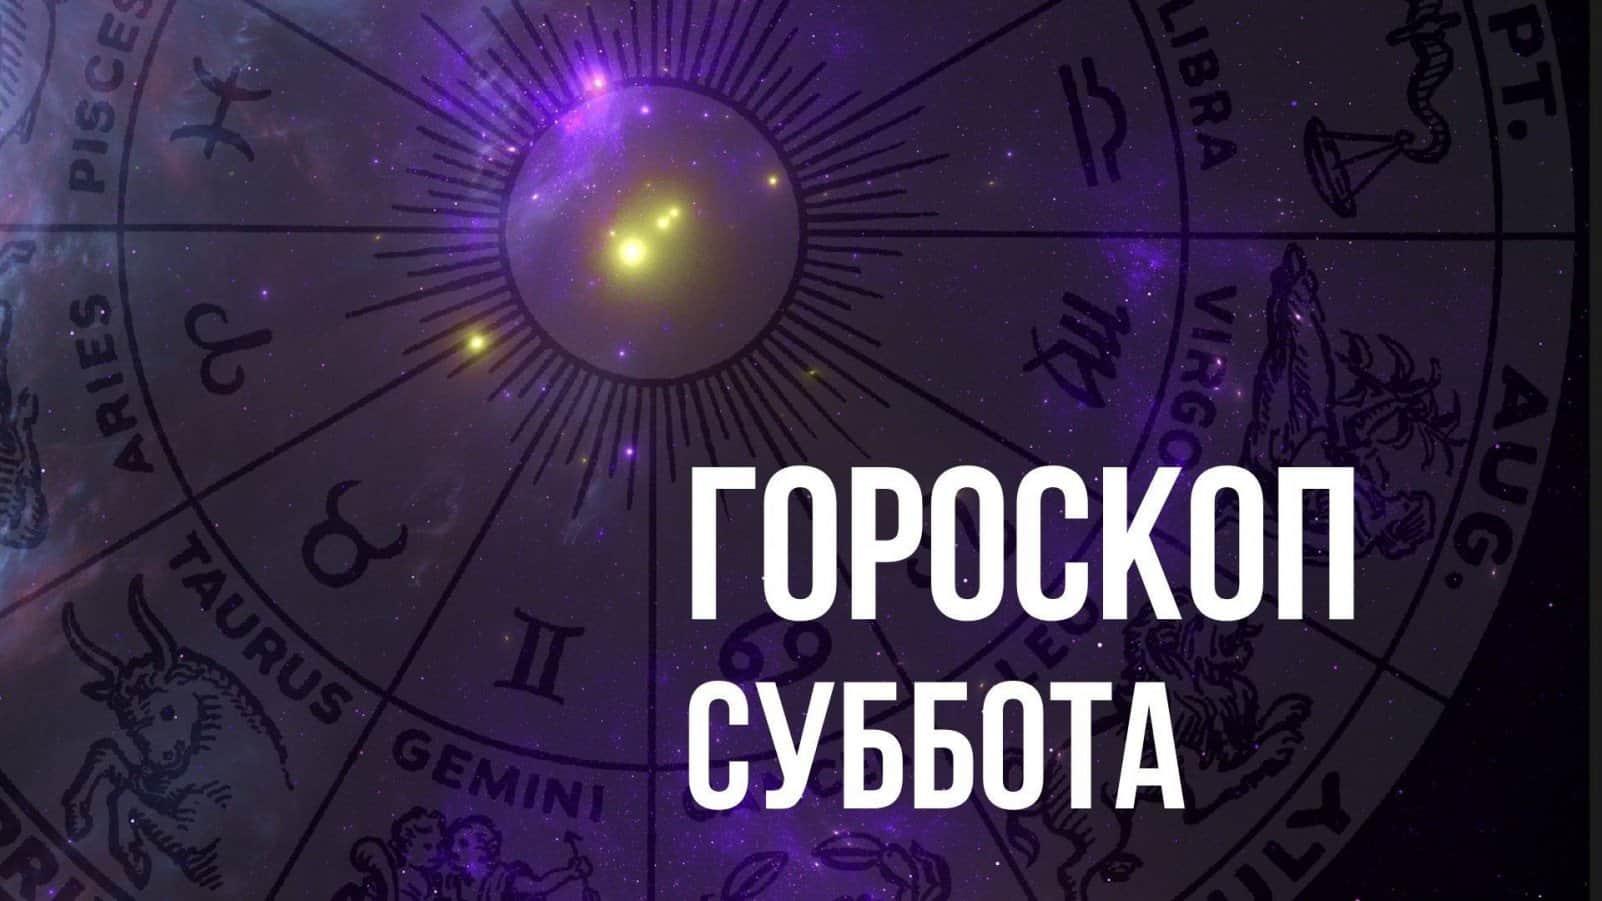 Гороскоп на субботу 27 марта для каждого знака Зодиака